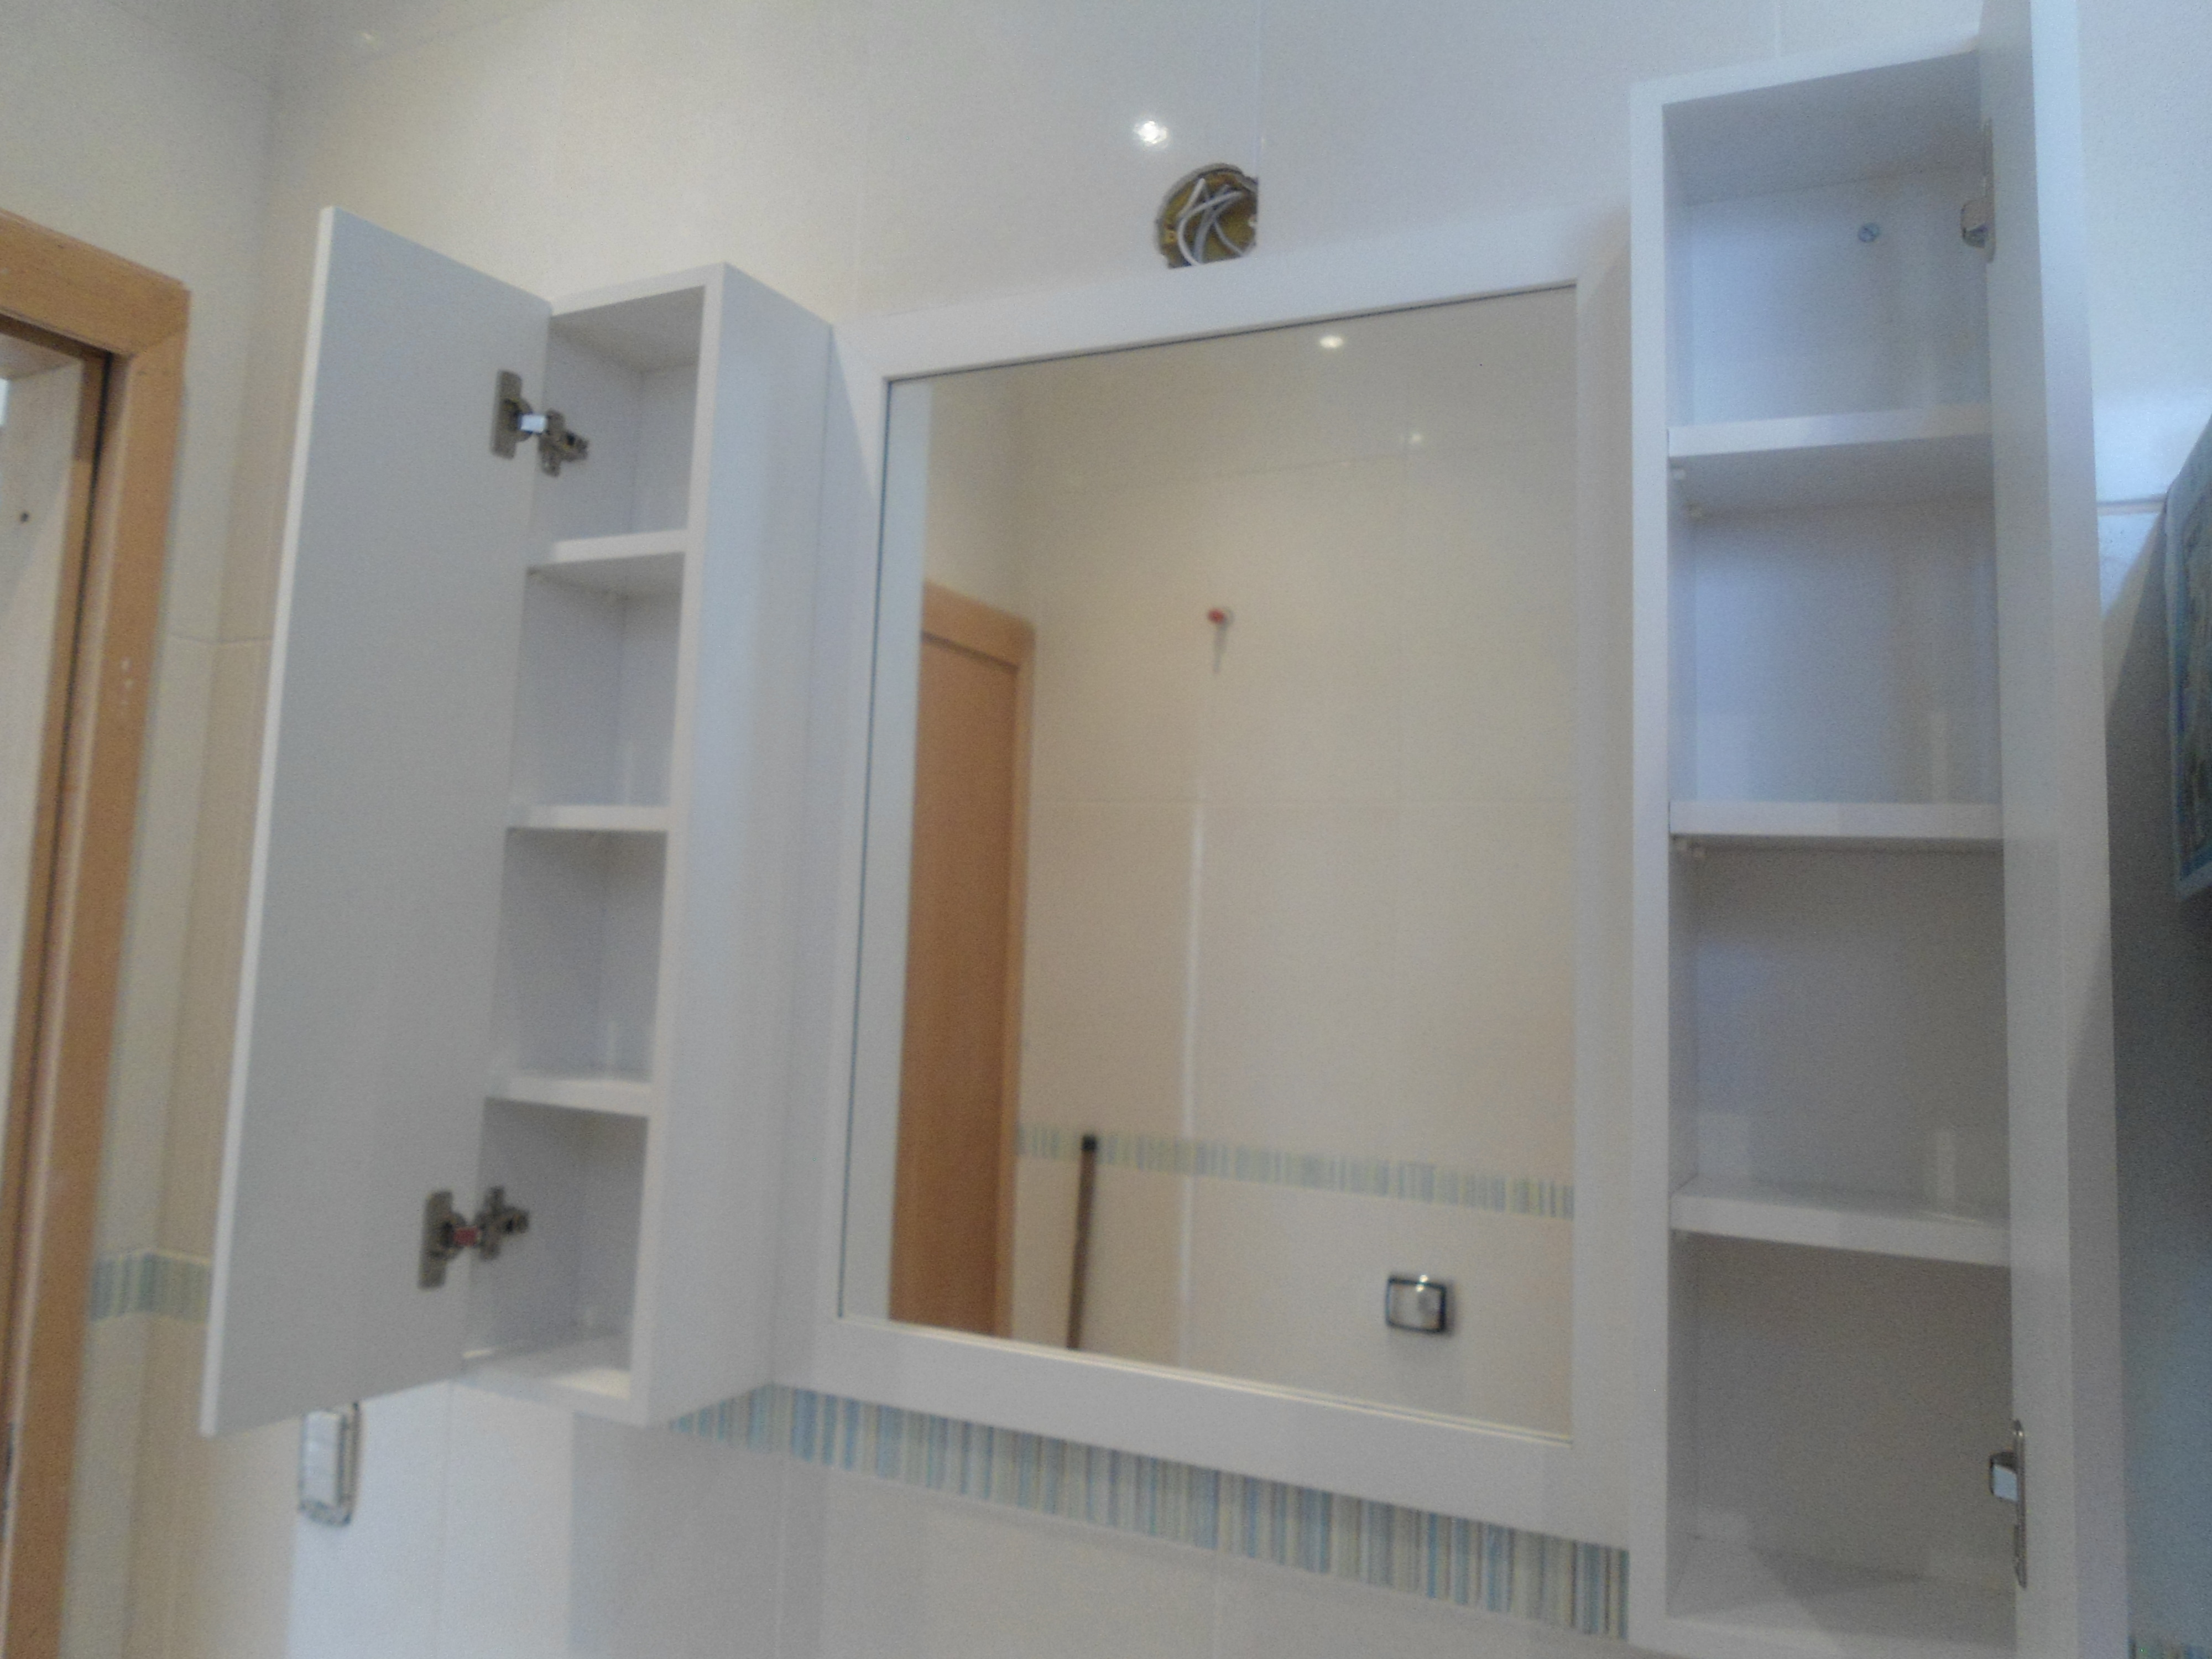 armario de banheiro armario de banheiro armario de banheiro #694F39 4000x3000 Banheiro Autocad